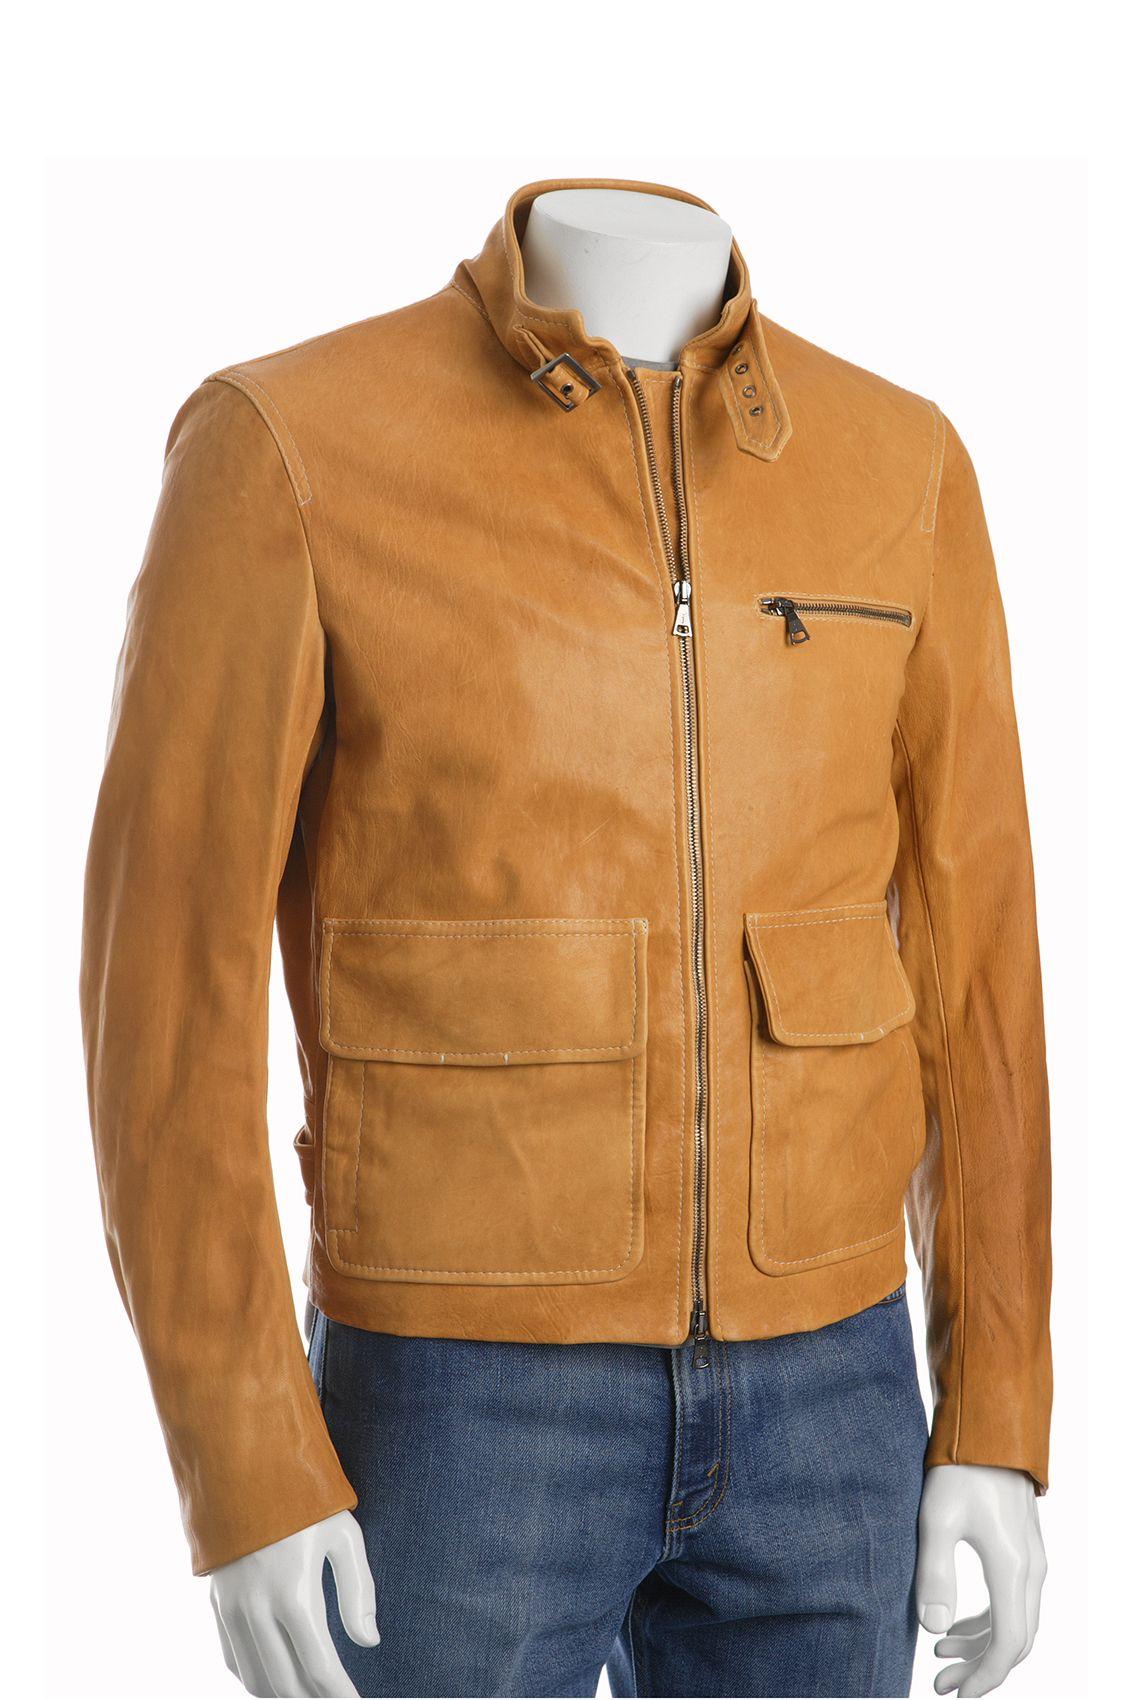 mustardleathermensjacket.jpg